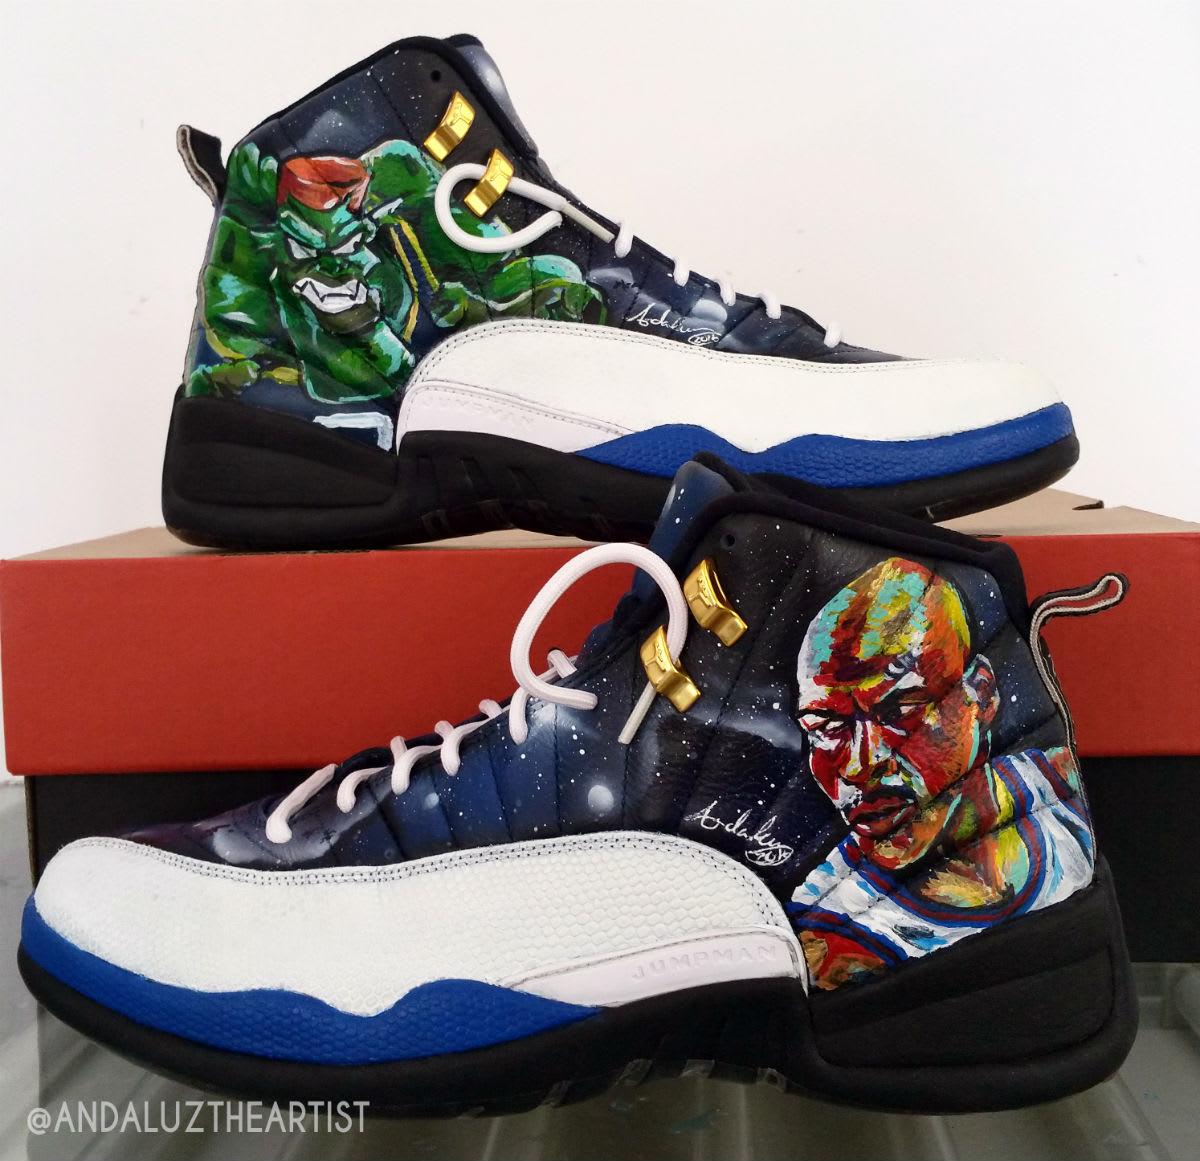 competitive price 83107 cb055 Nike SB Blazer Space Jam Custom by frshco - Space Jam Air ...